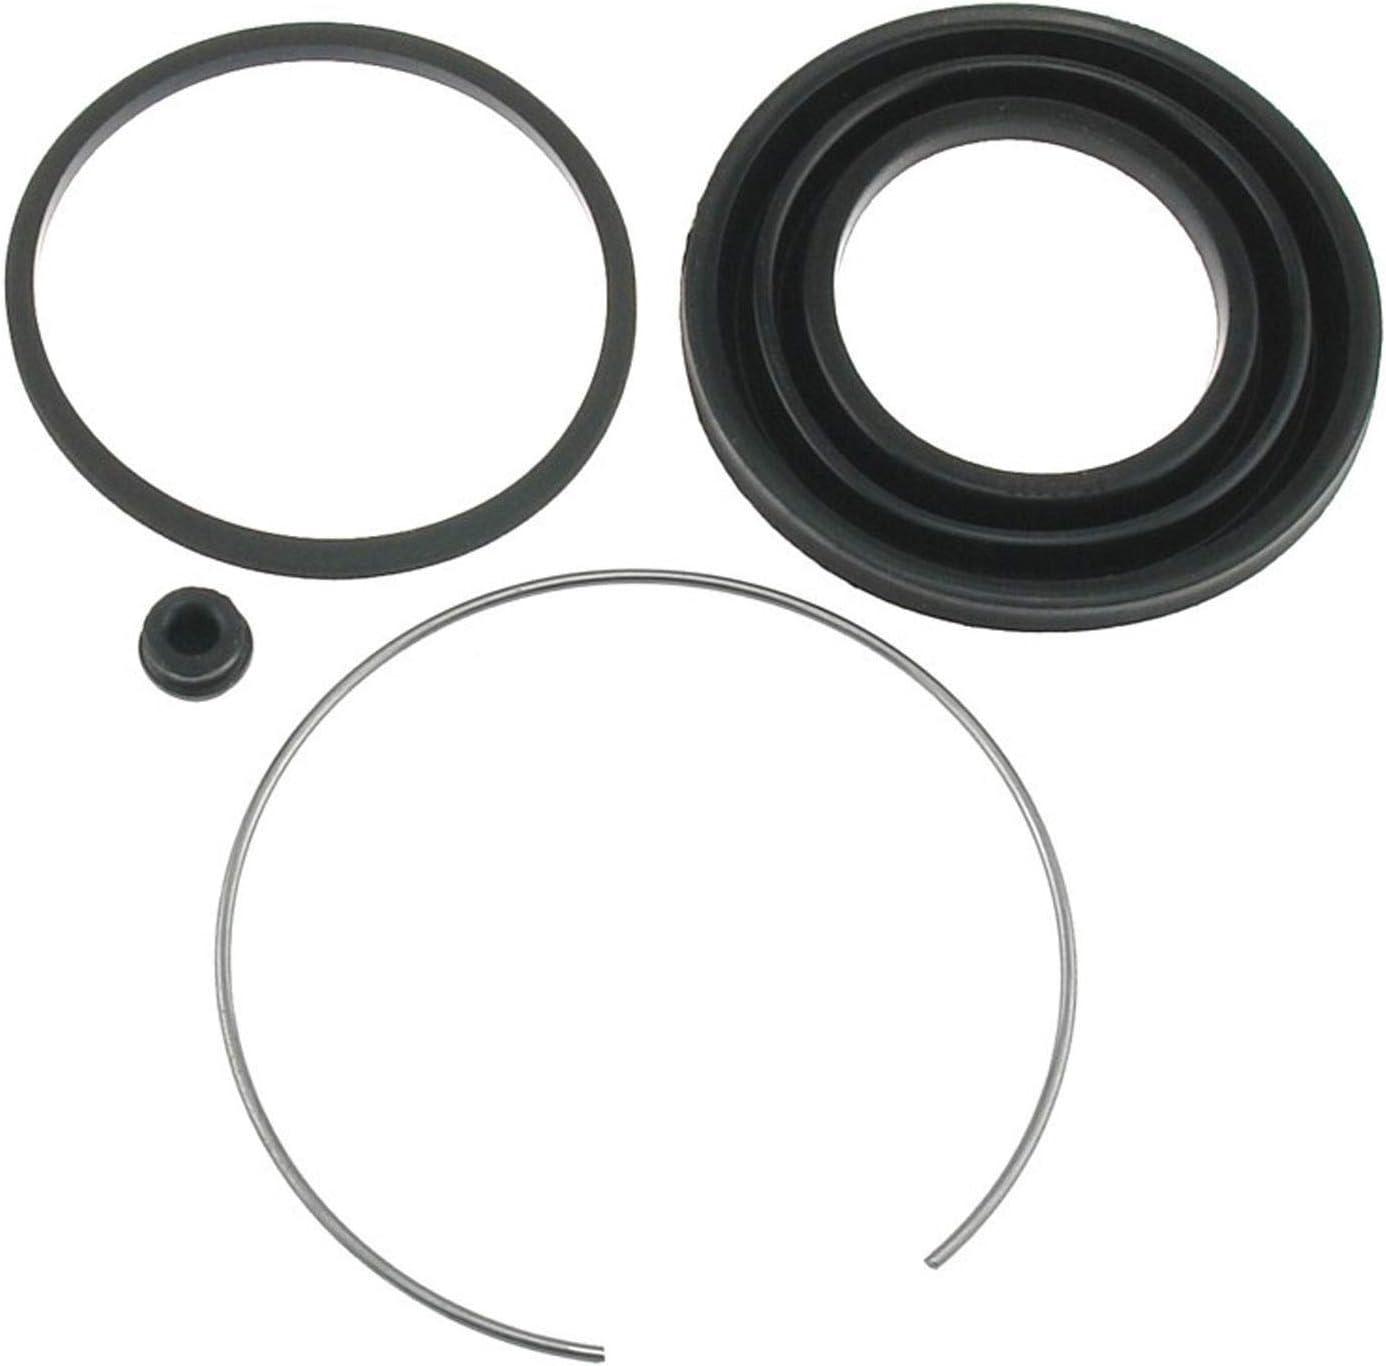 Carlson NEW before selling ☆ Quality Brake Parts Kit Repair Caliper Ranking TOP2 15254